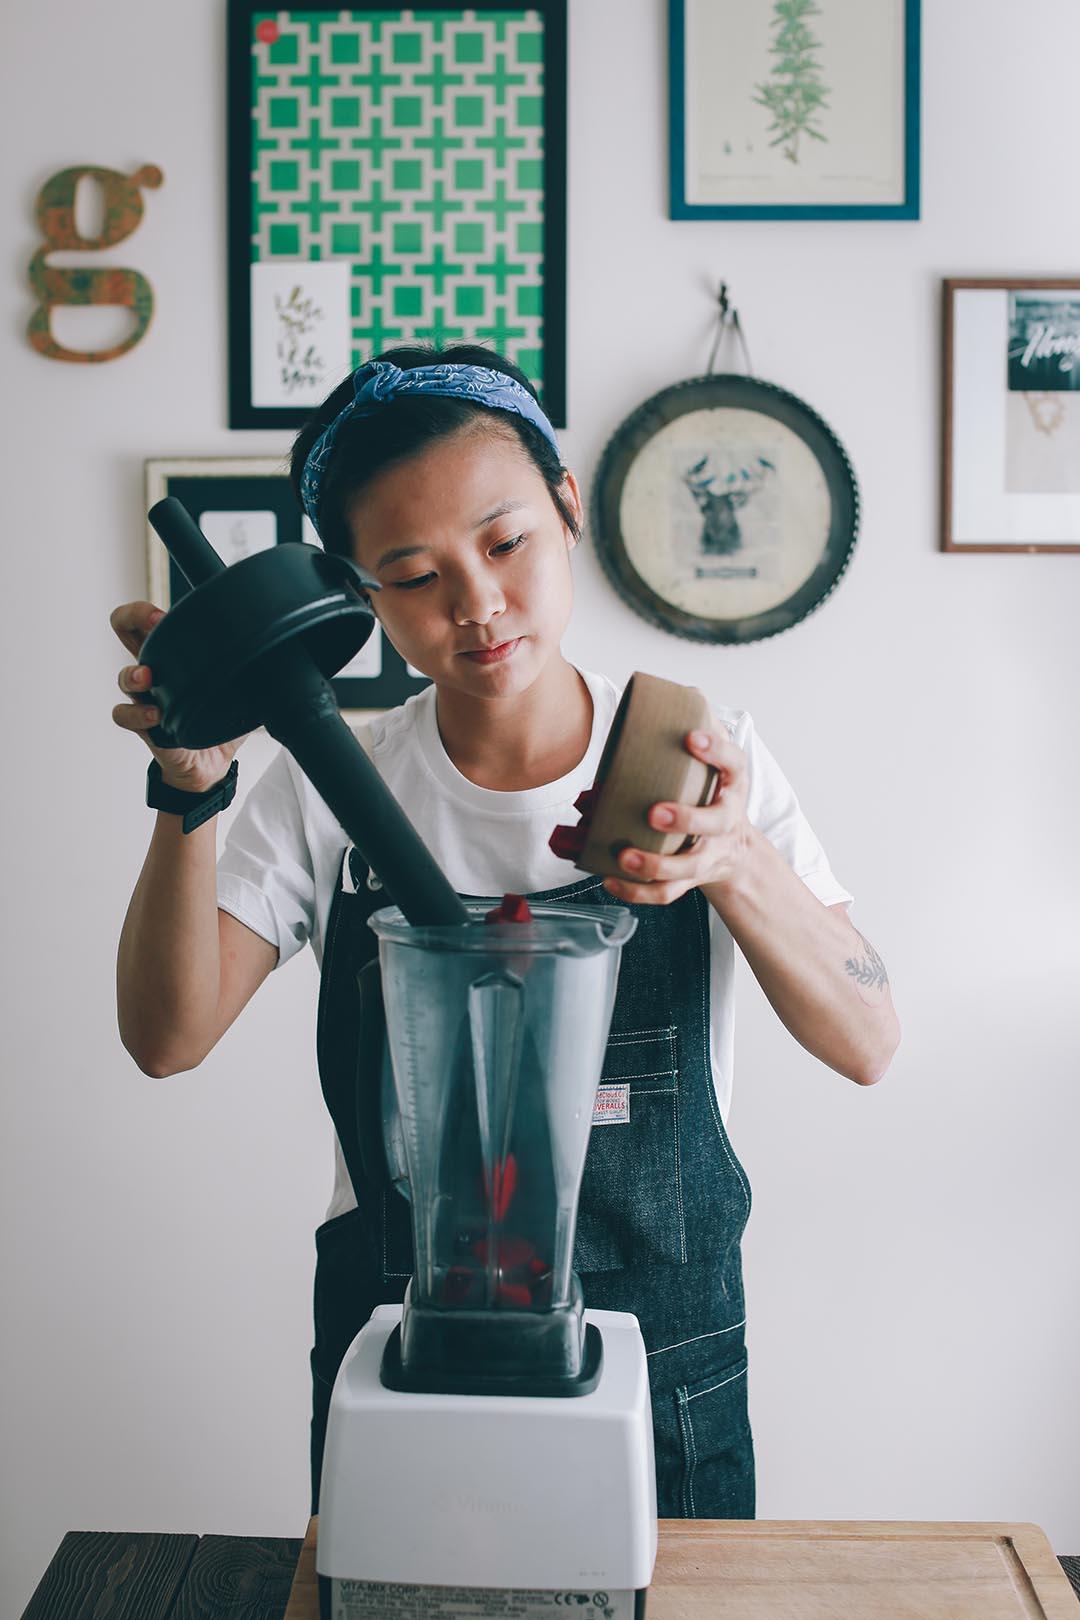 Gee 是髮型師,也是 raw food 廚師。攝:王嘉豪/端傳媒